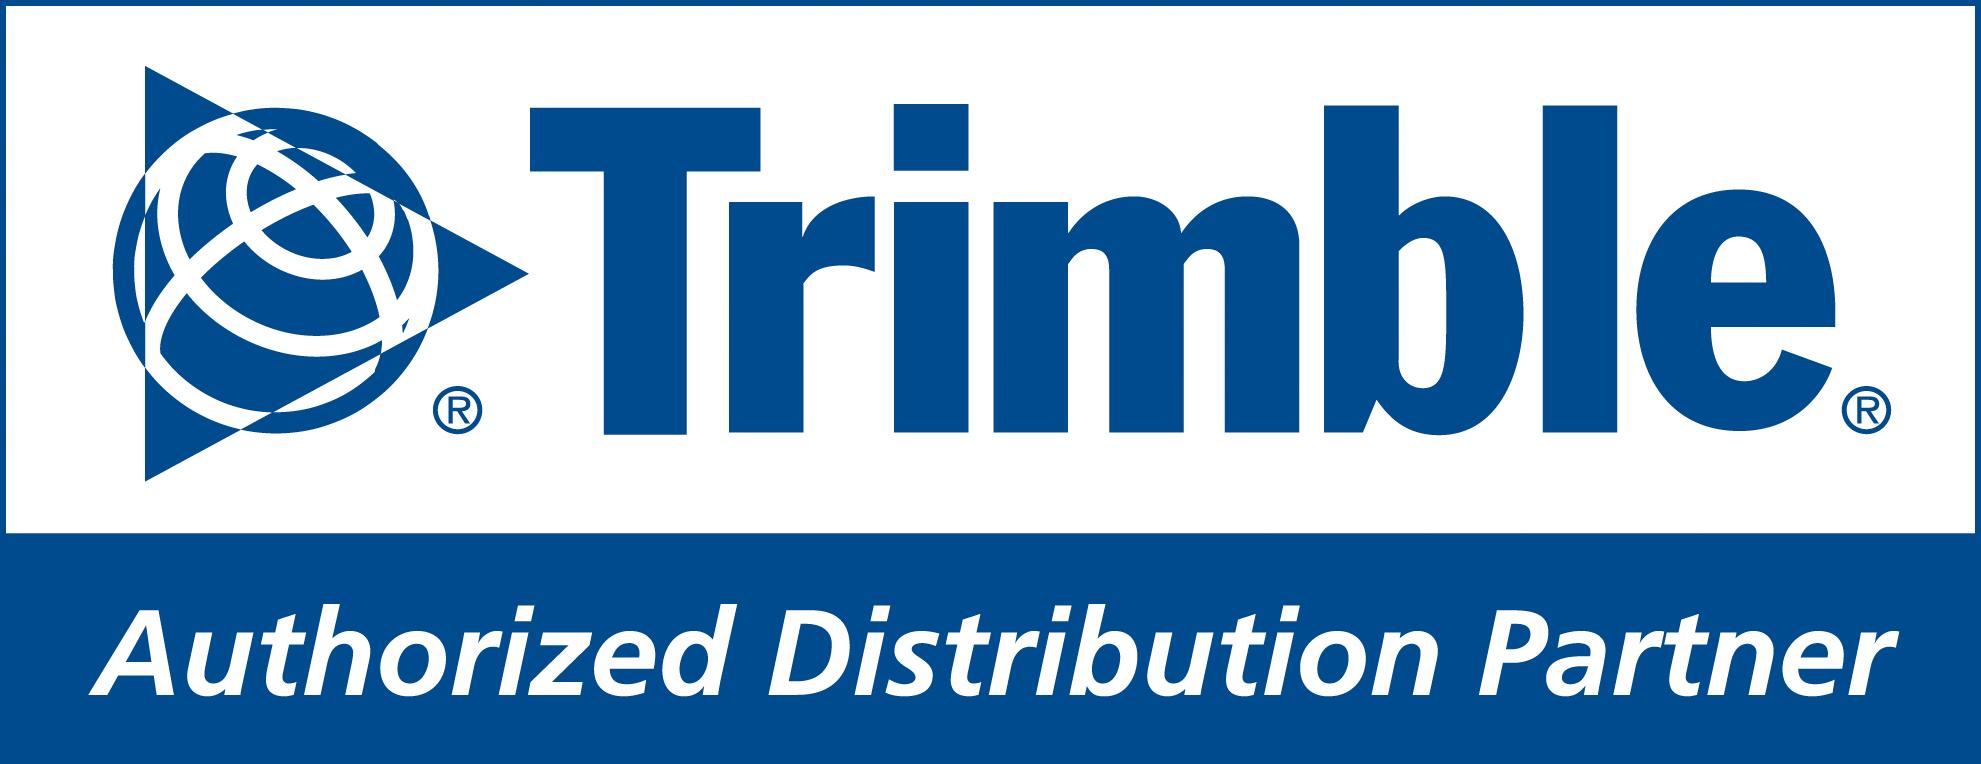 trimble-authorized-distribution-partner-1-.jpg